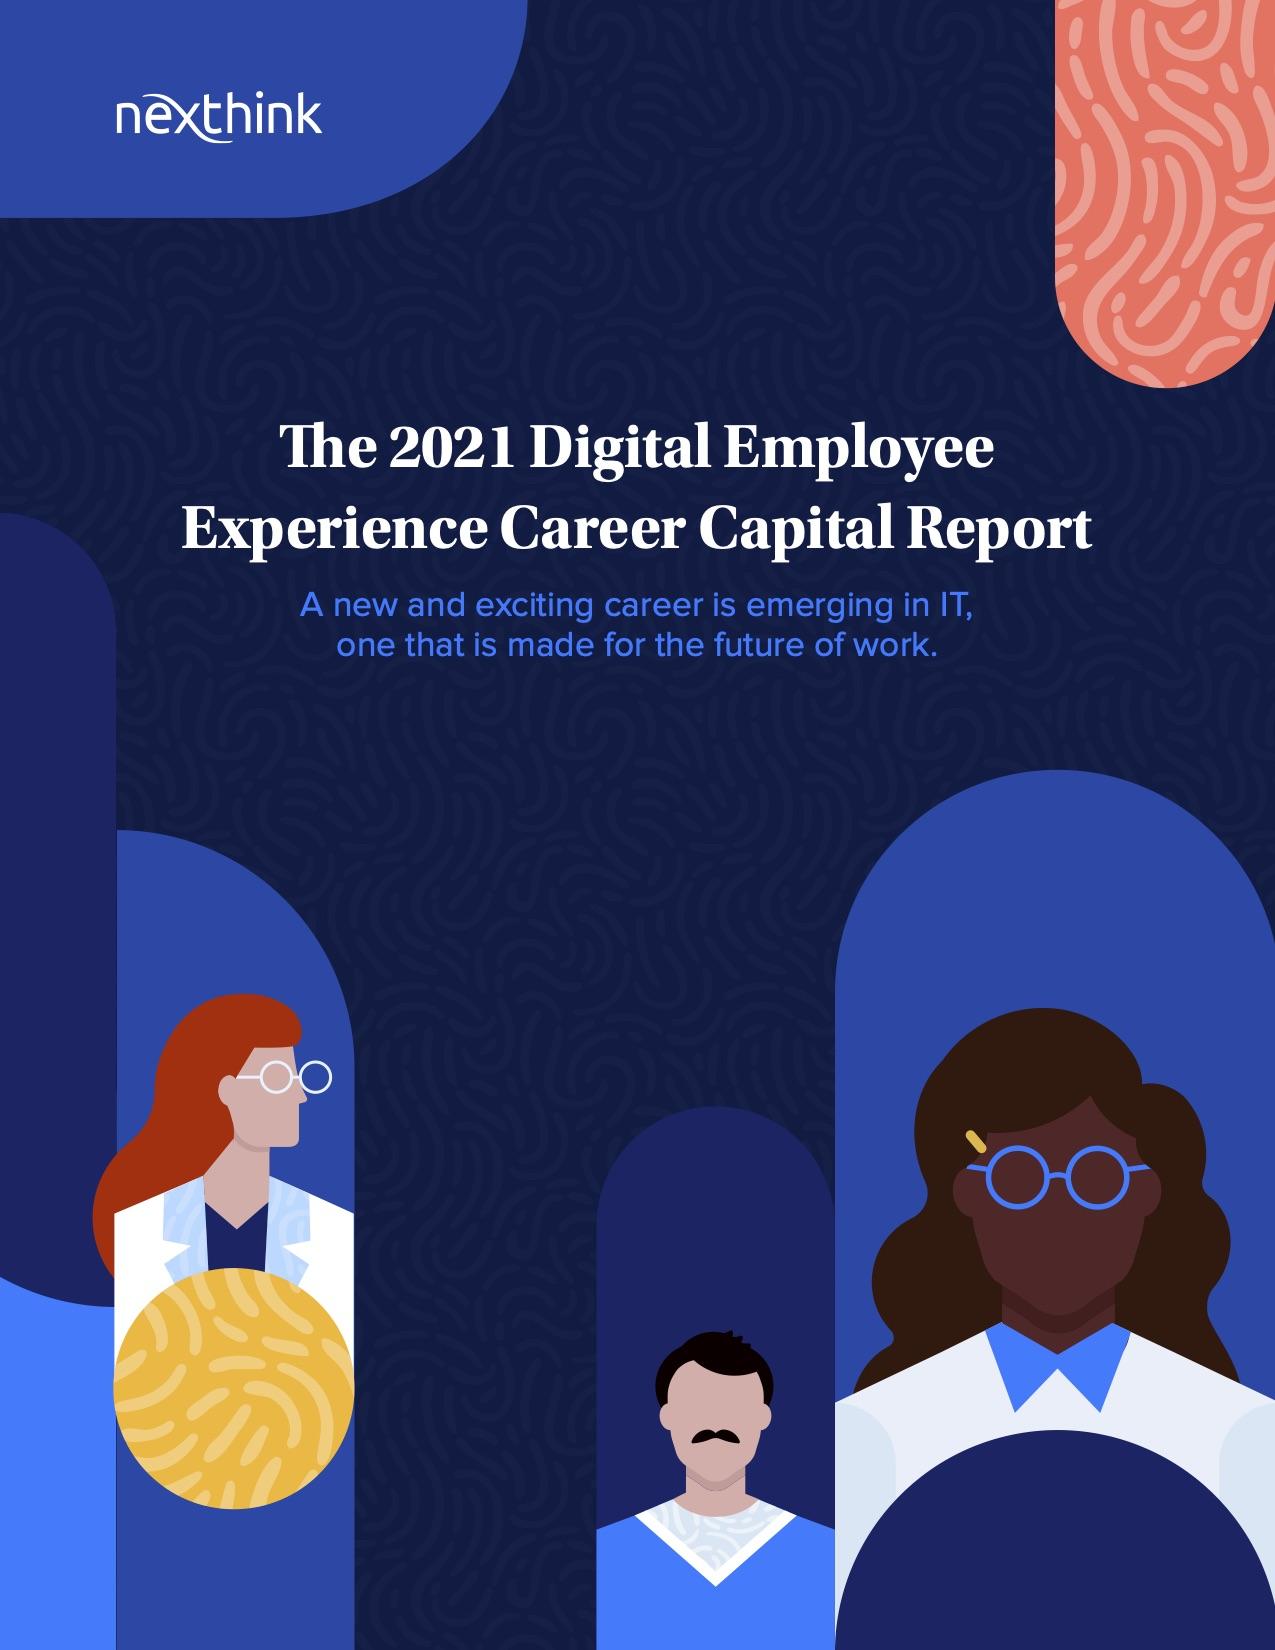 The 2021 DEX Career Capital Report